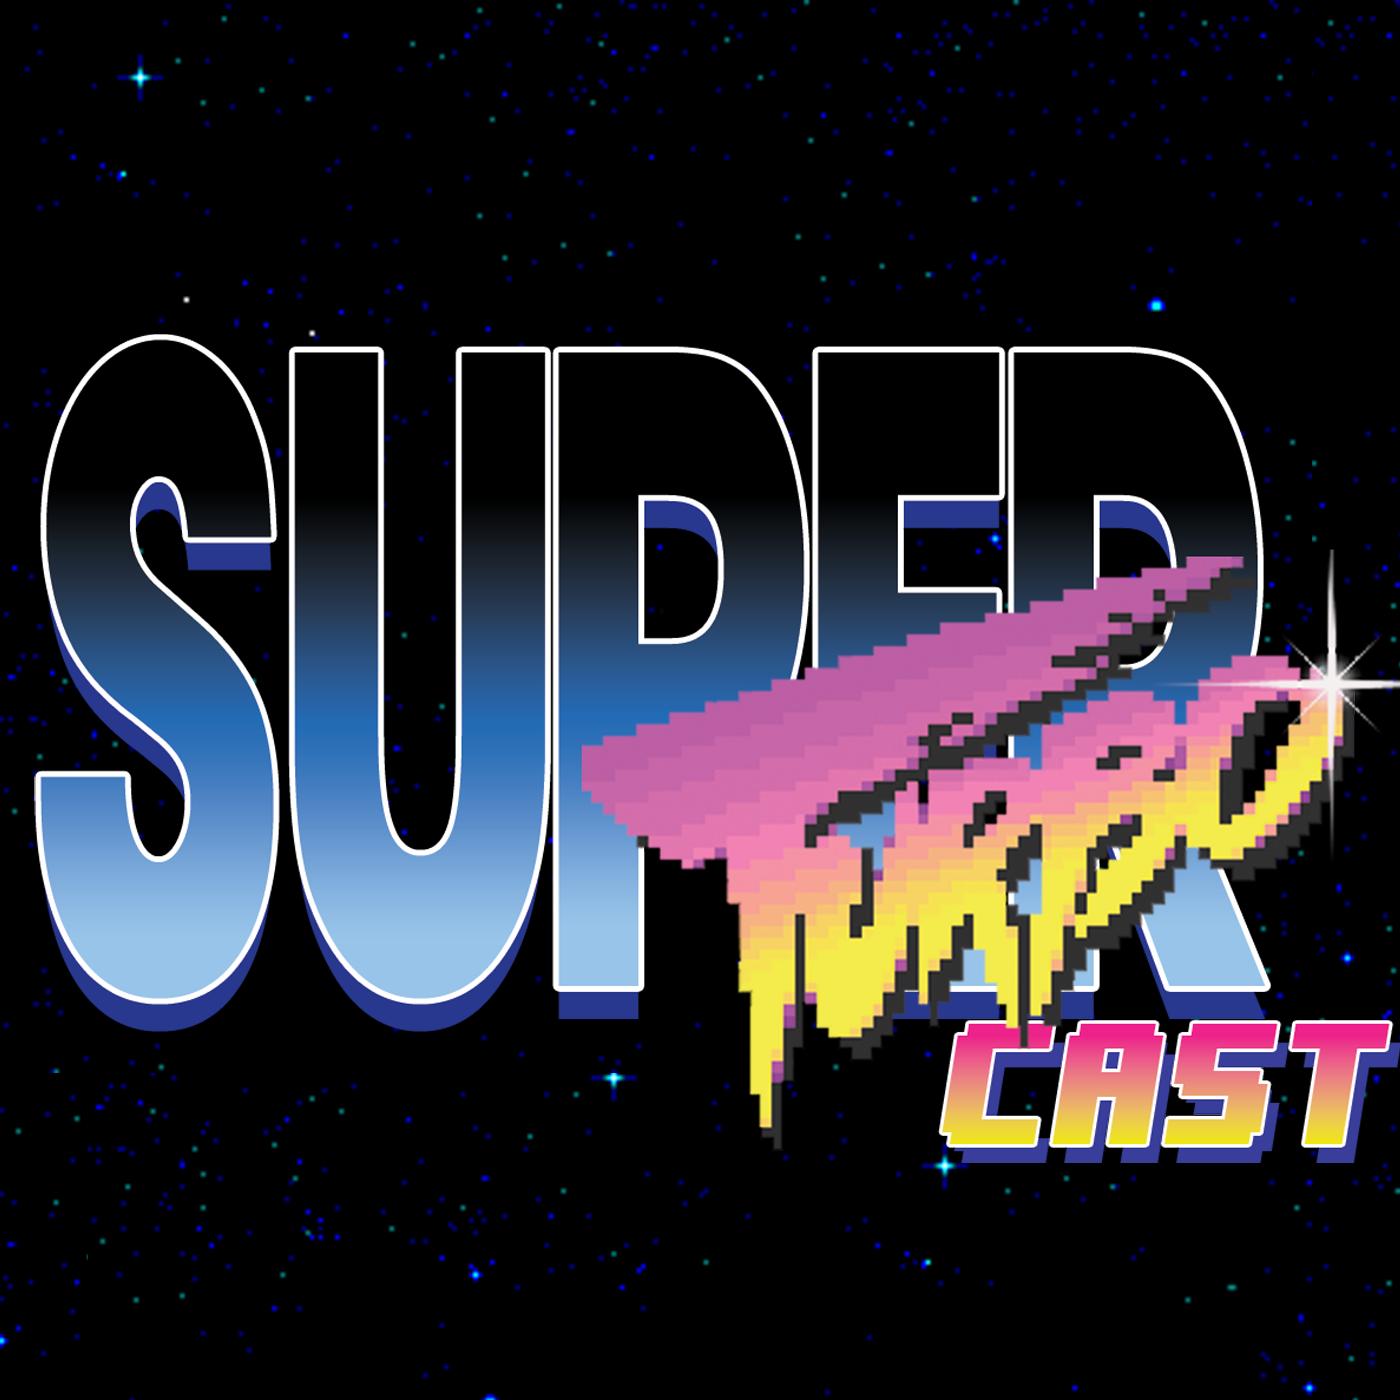 Super Turbocast